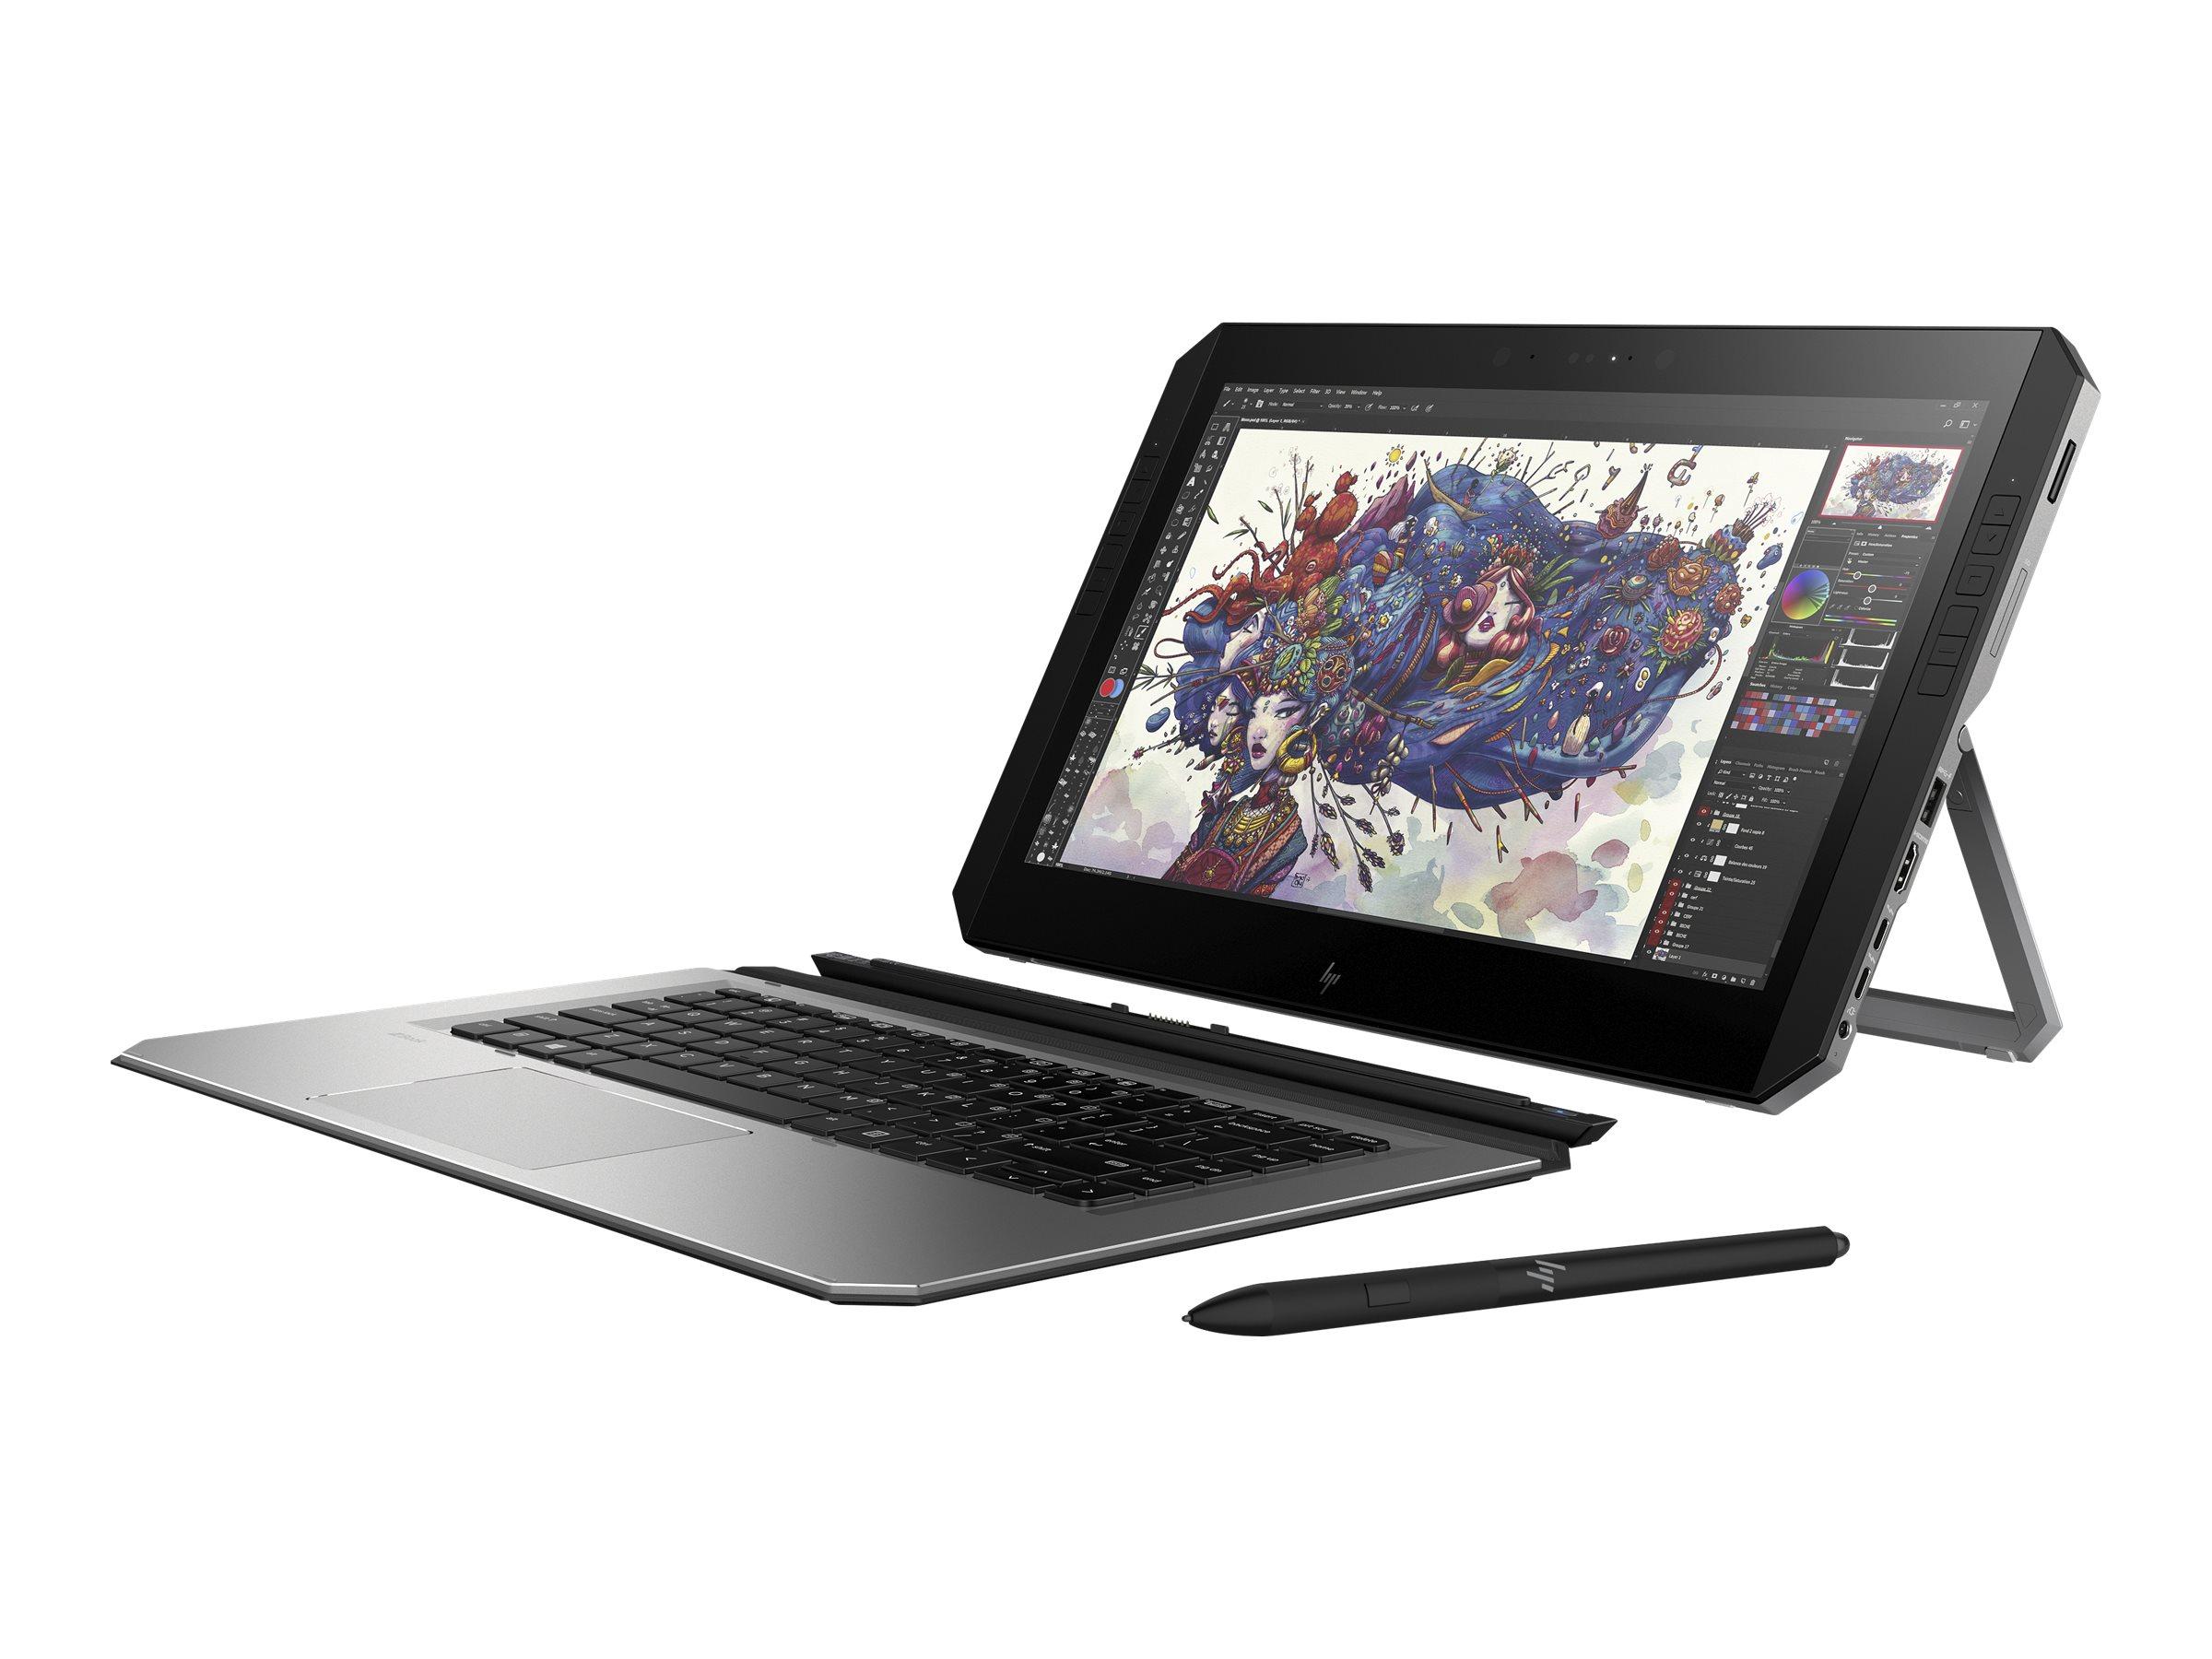 Hp zbook x2 g4 detachable workstation tablet mit bluetooth tastatur core i7 8550u 1 8 ghz win 10 pro 64 bit 8 gb ram 8495058 2zc10ea abd